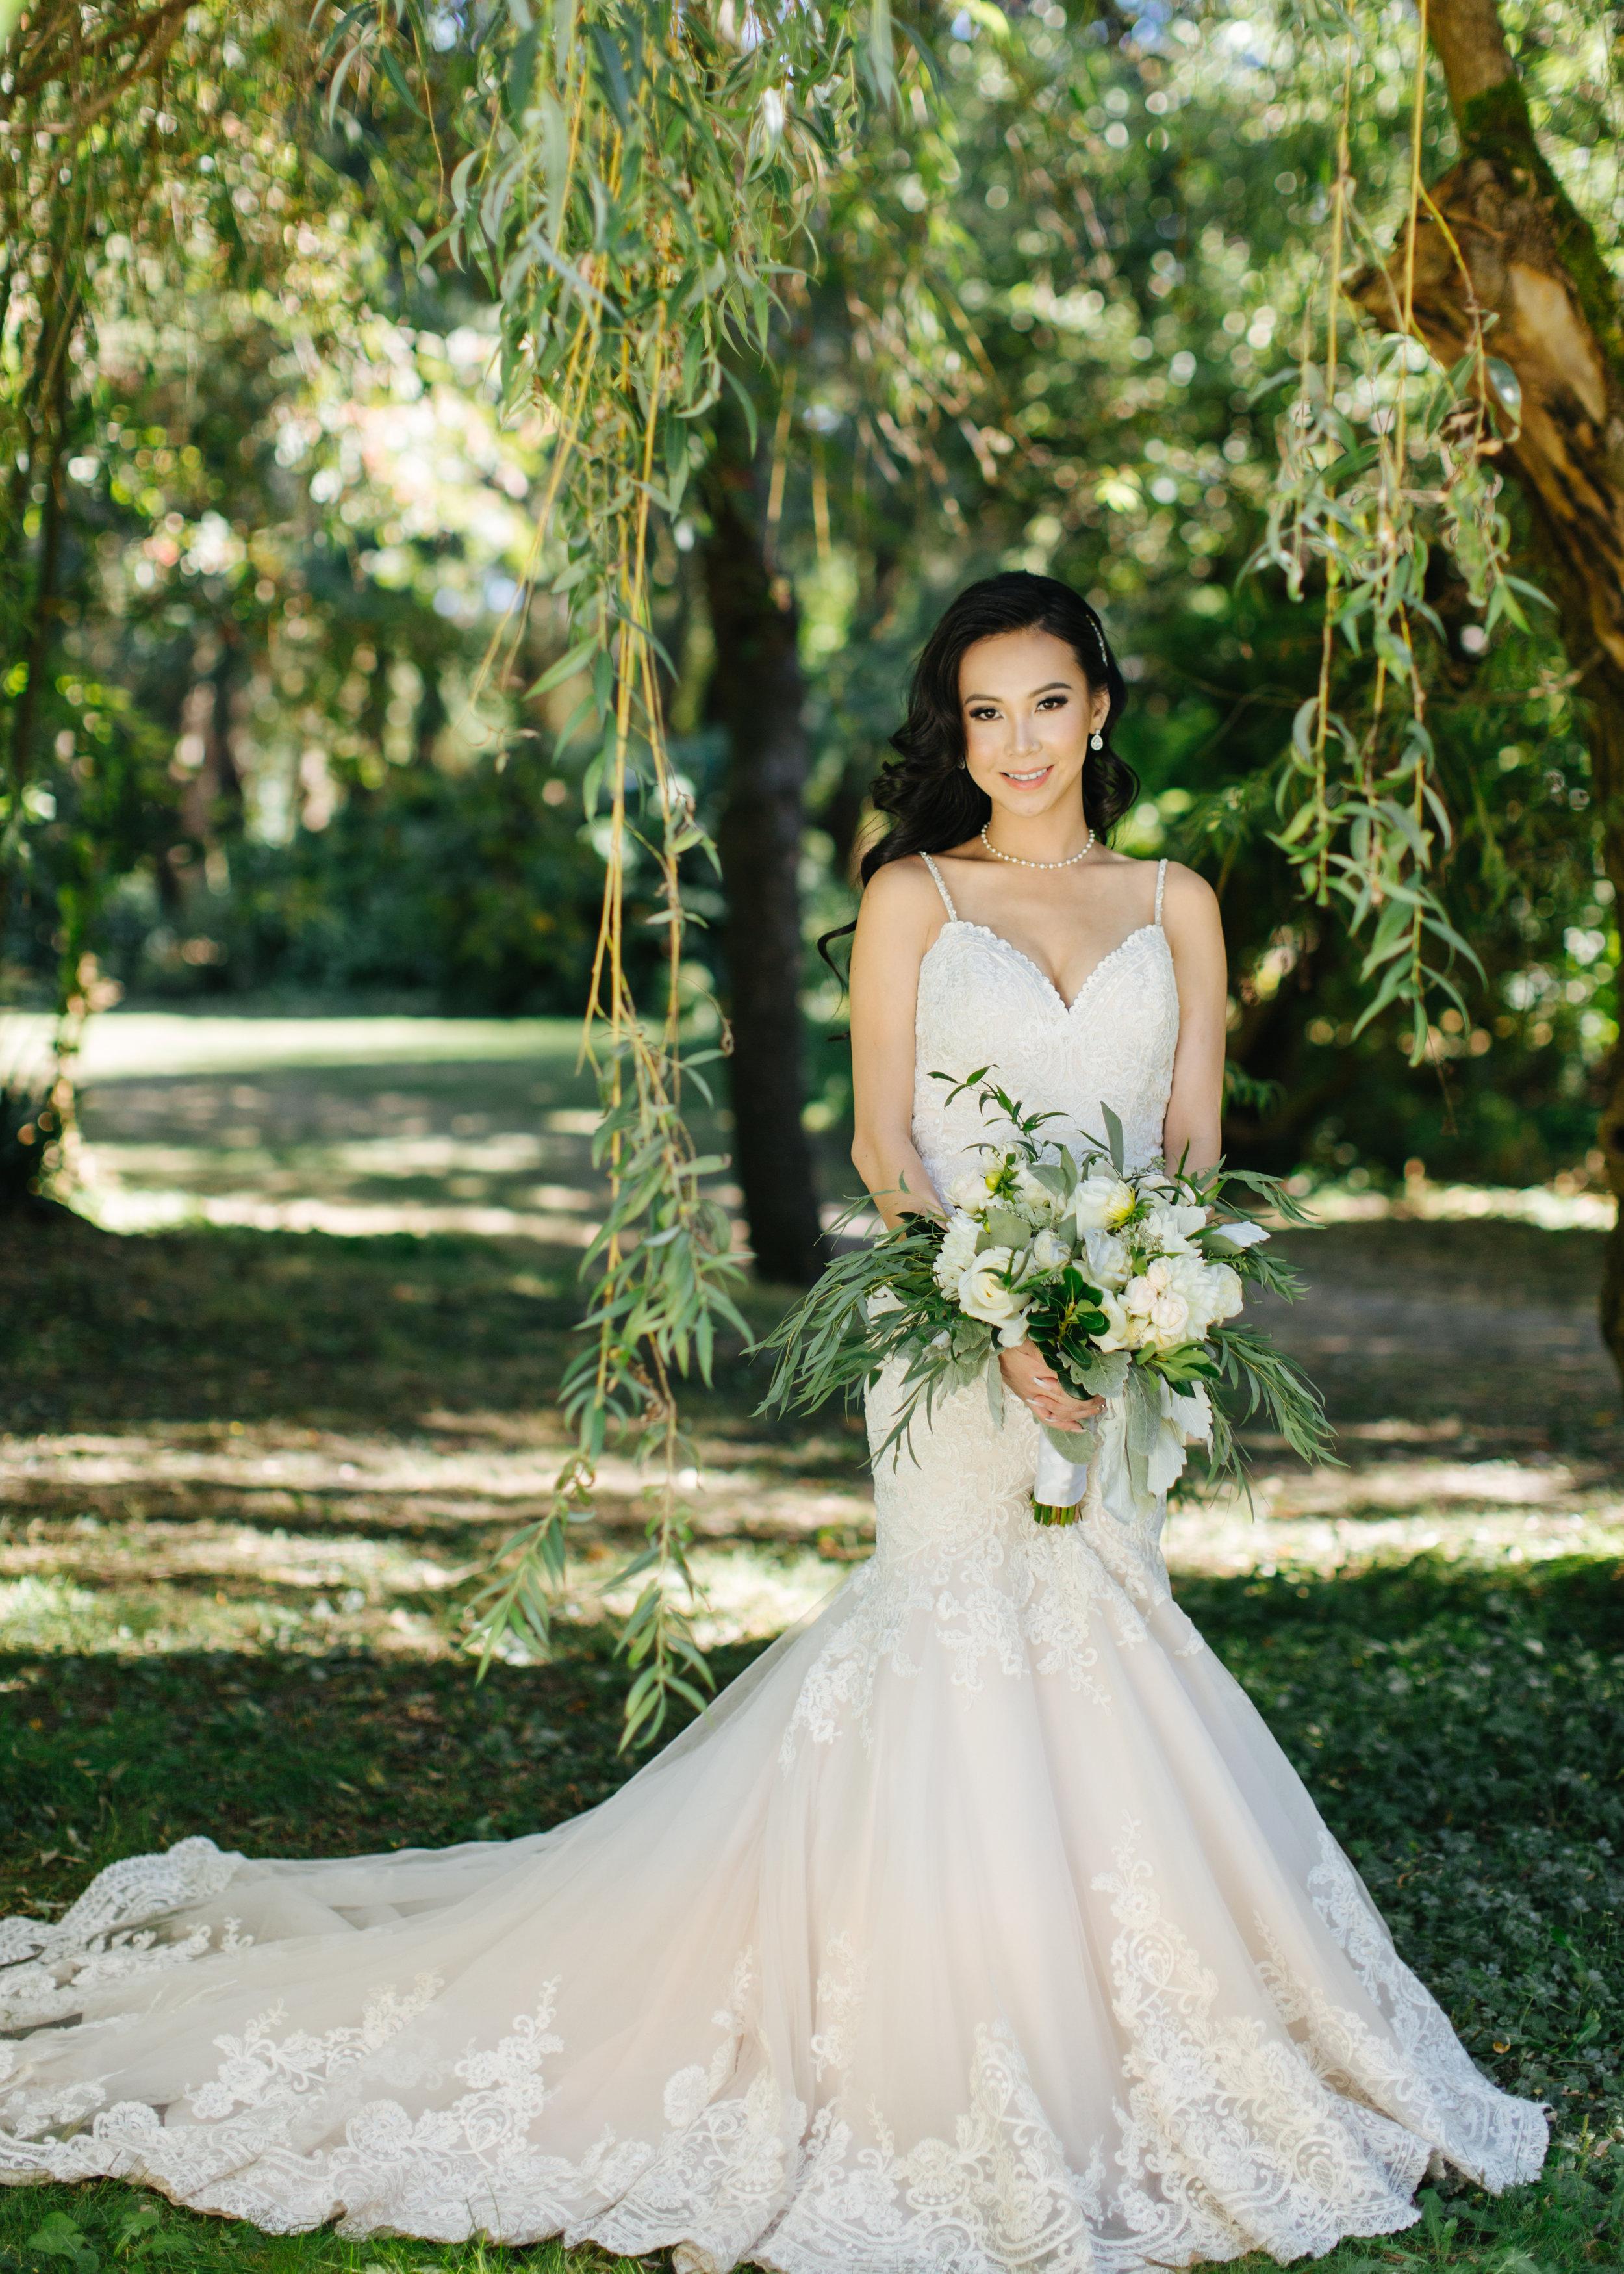 herastudios_wedding_ashley_david_hera_selects-84.jpg